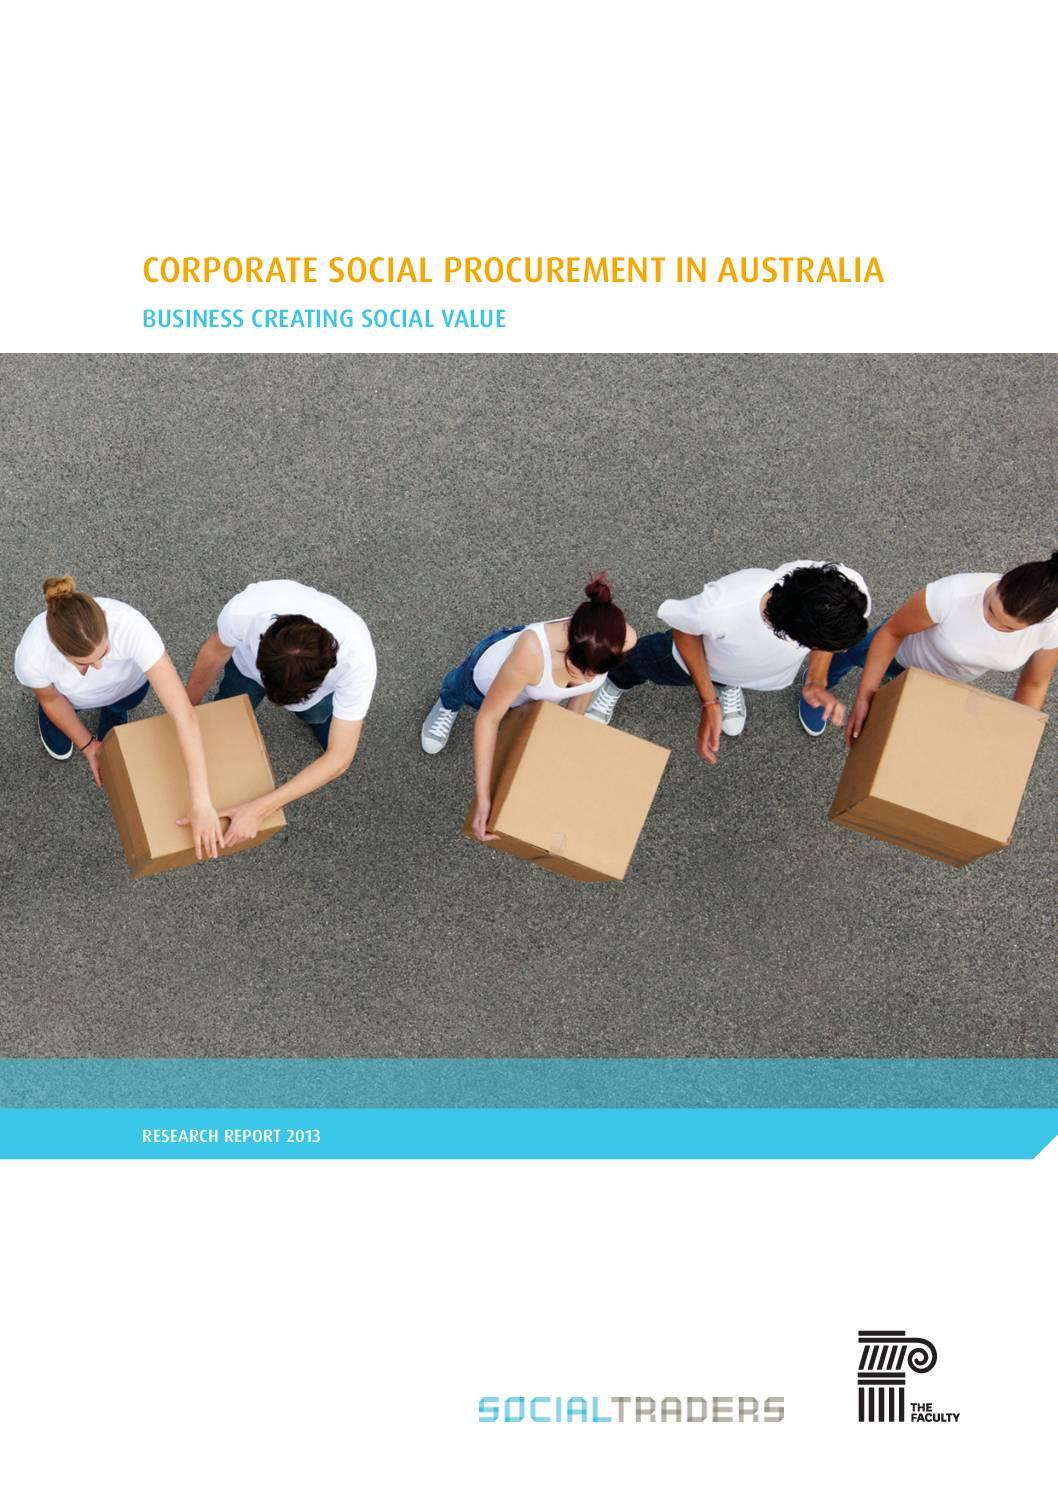 Corporate Social Procurement in Australia